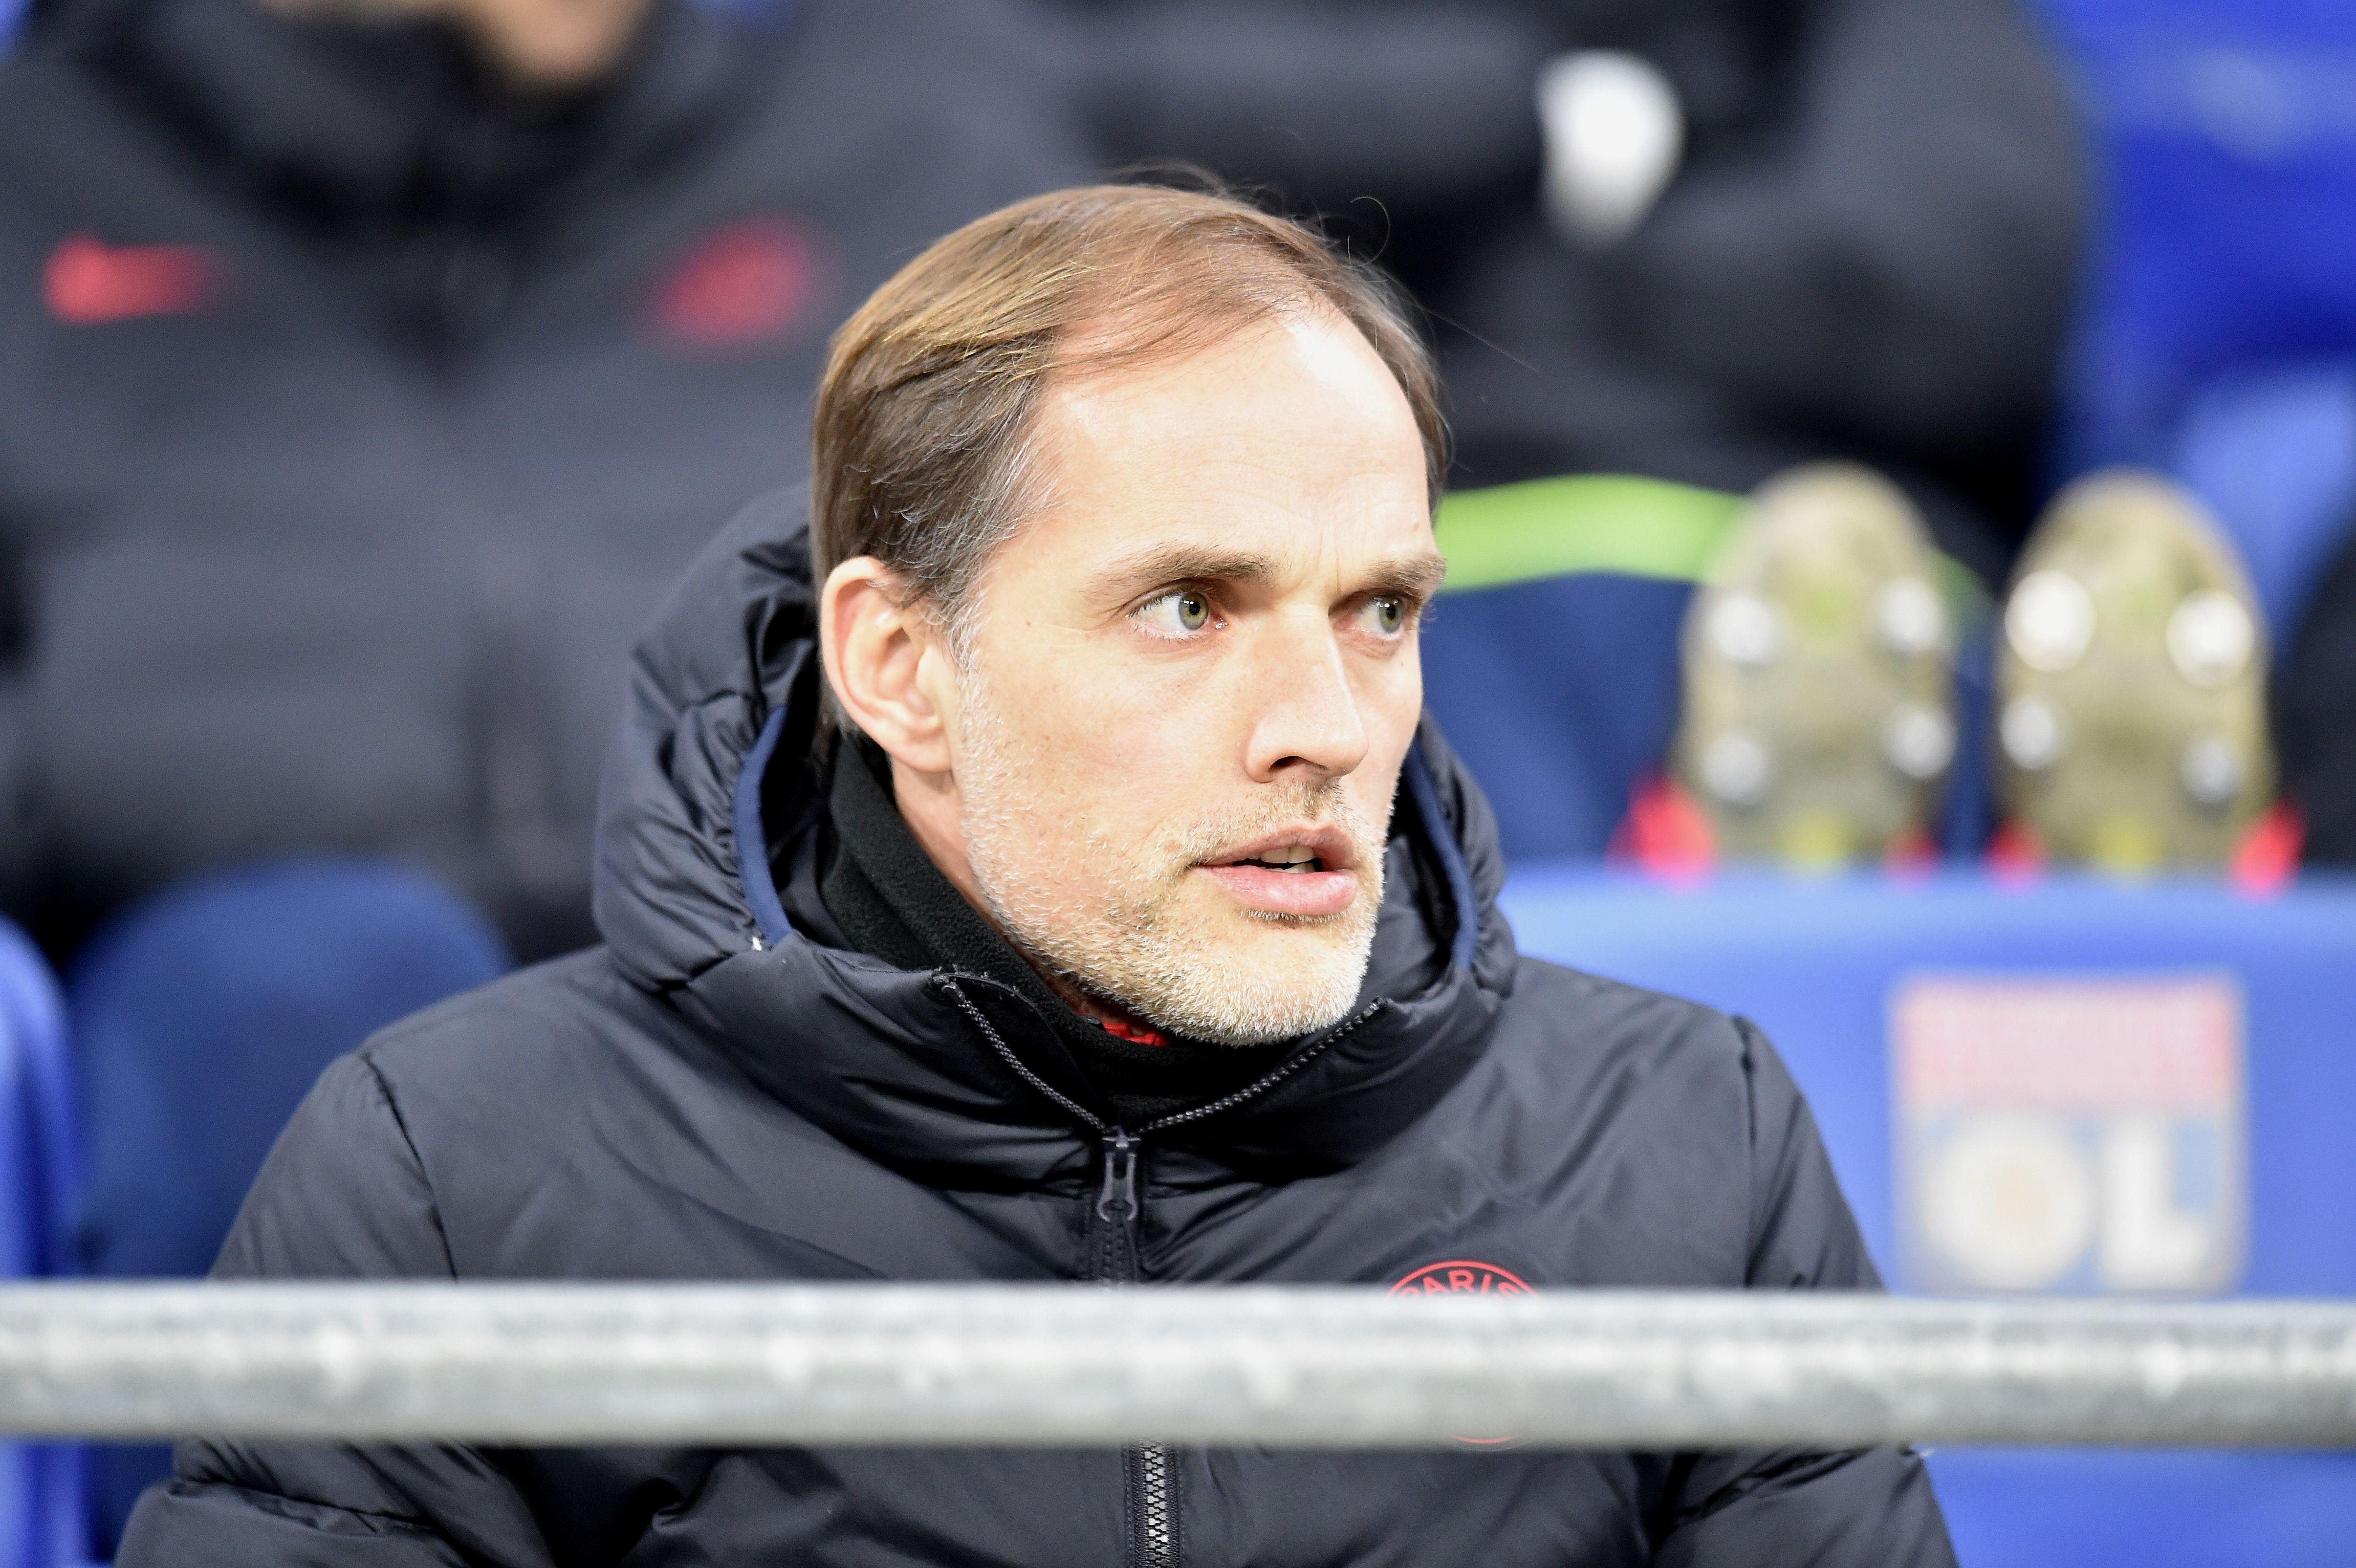 Football - Ligue des champions - Tuchel avant PSG-Dortmund : «On a une équipe qui aime attaquer, et on va attaquer»